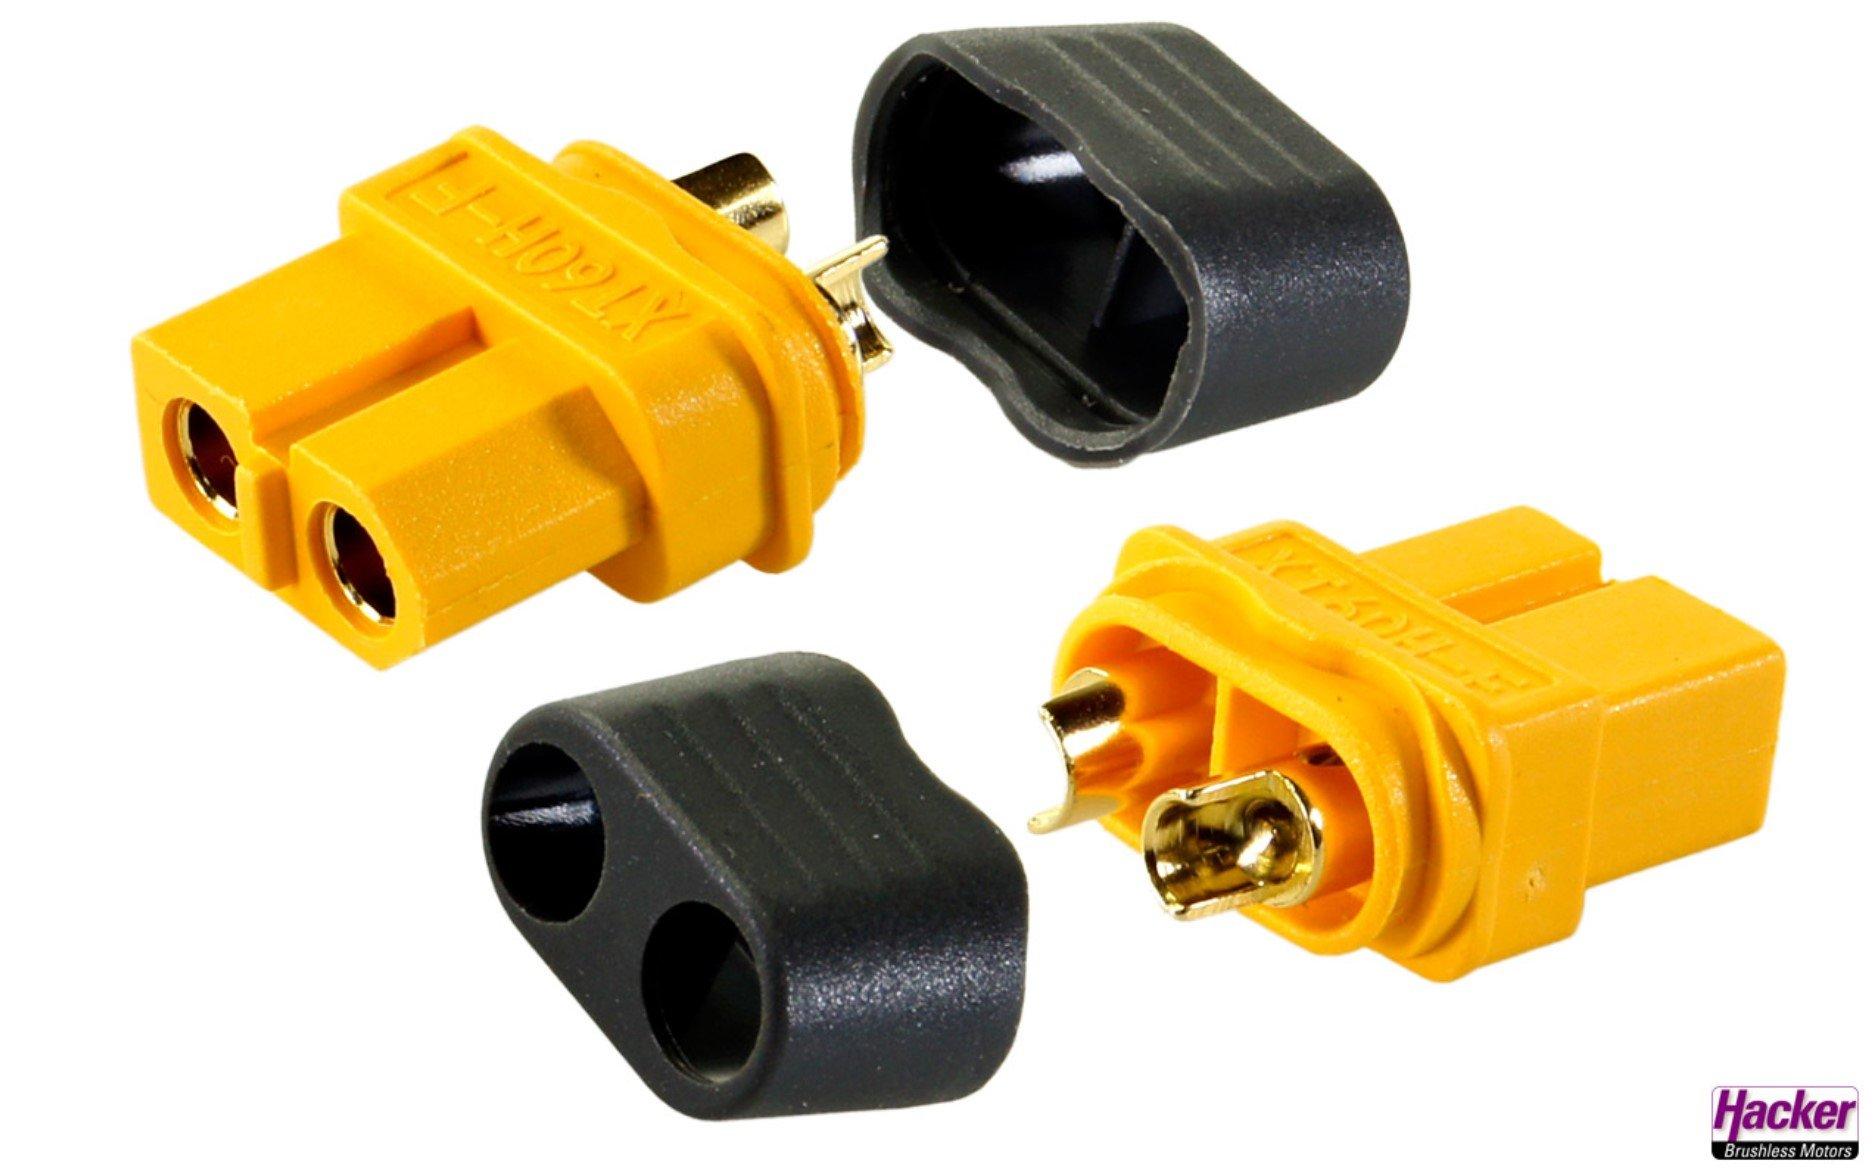 XT60+ sockets (5 pieces)